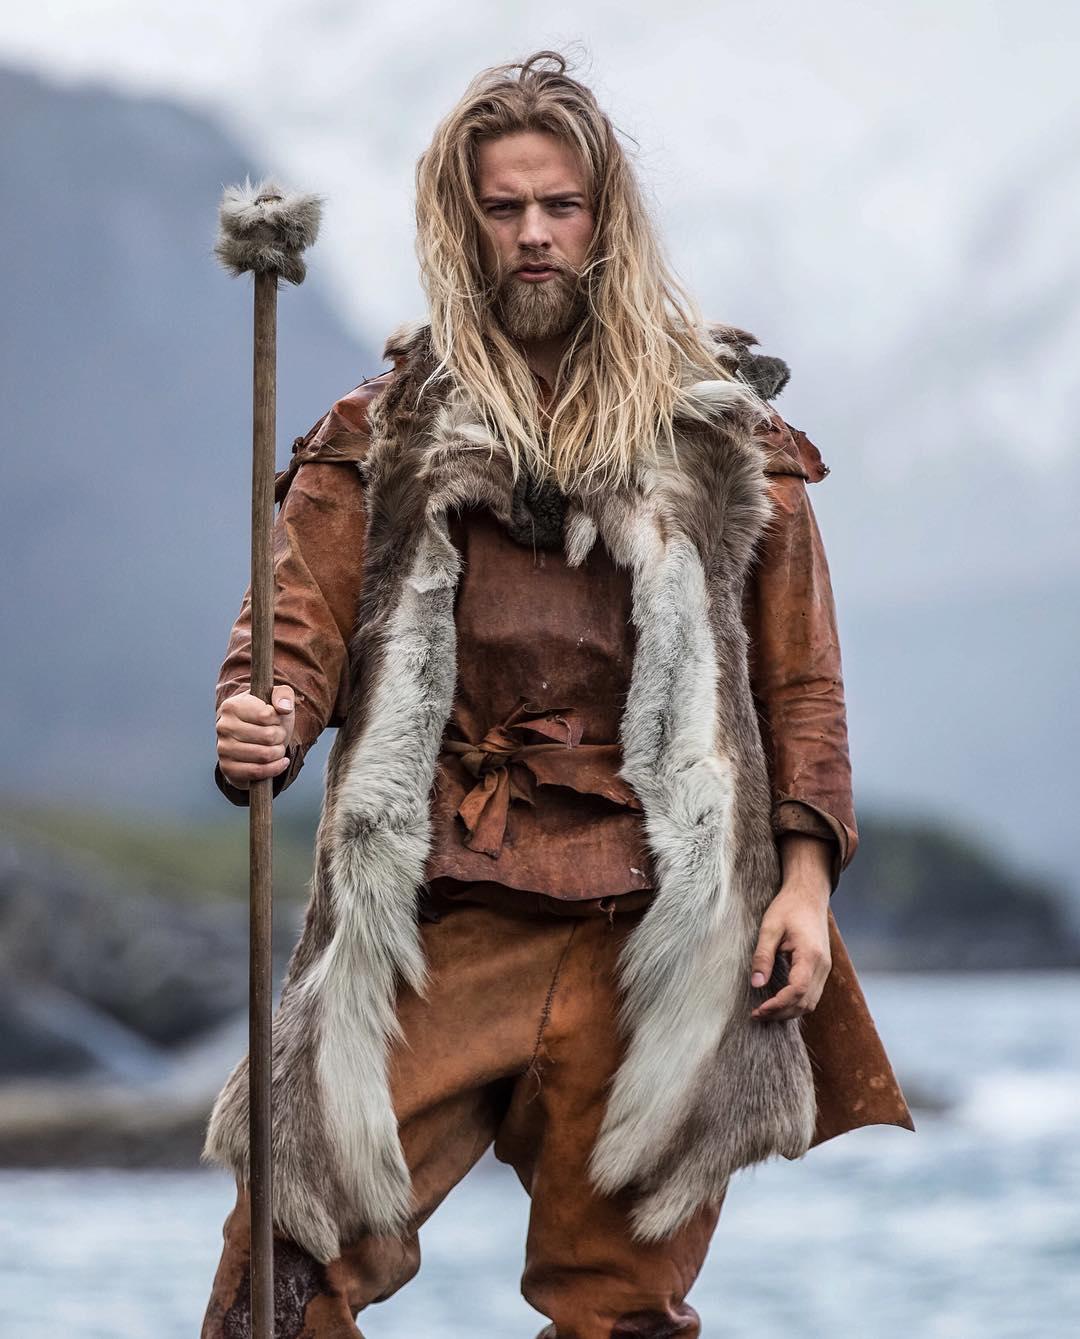 barba 2017, cabelo longo masculino, cabelo loiro, homem estiloso, tenente da marinha, moda sem censura, alex cursino, estilo viking, lumberssexual, mens, grooming, (11)